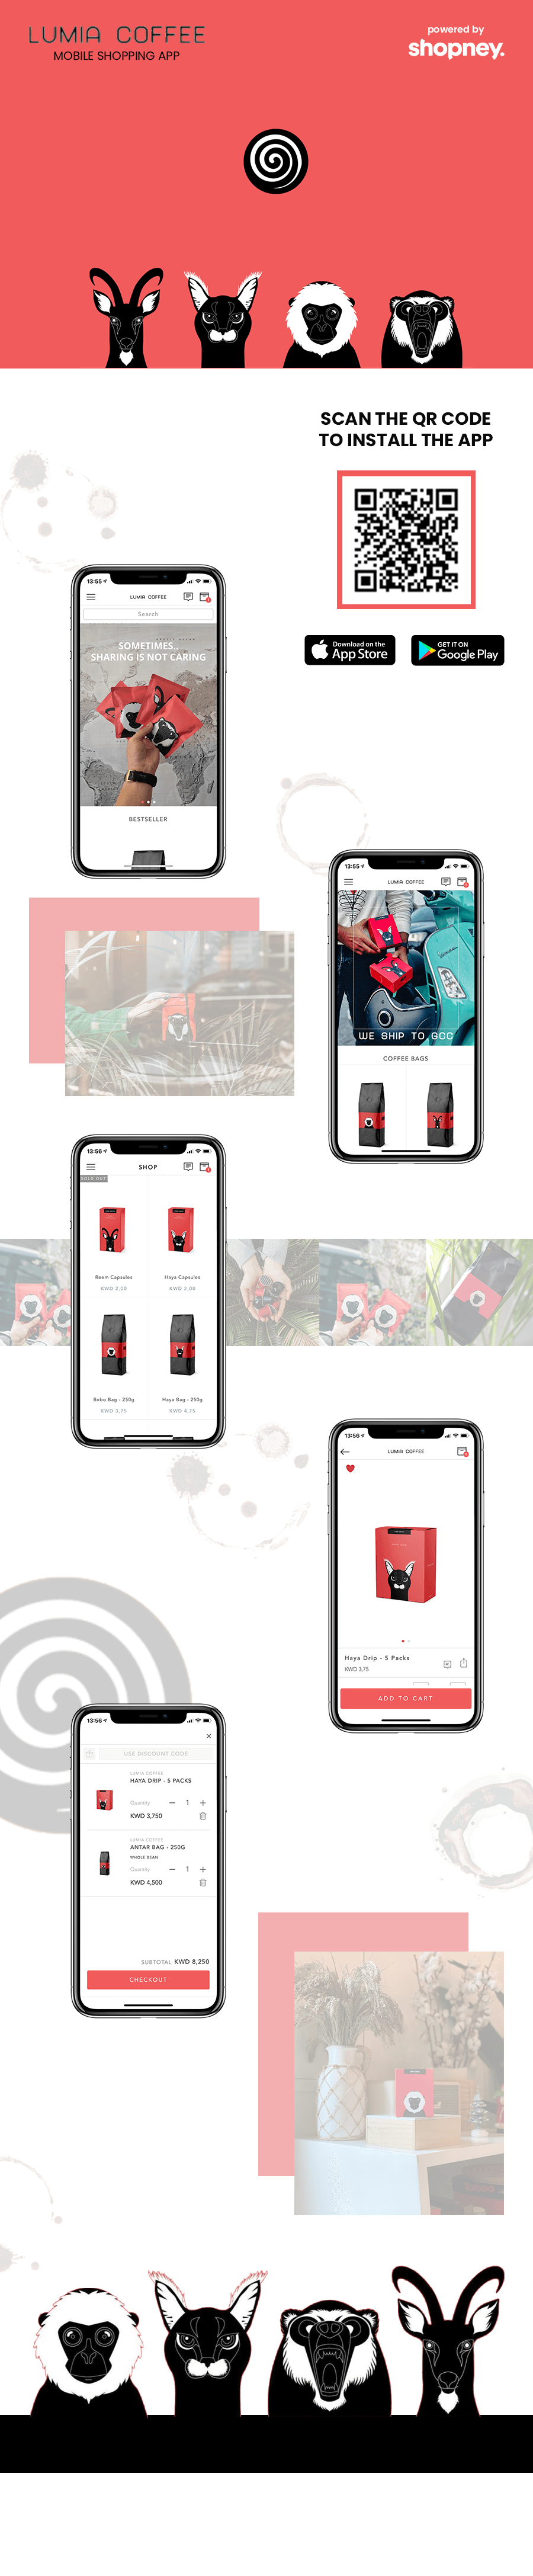 shopify mobile app - create native mobile app